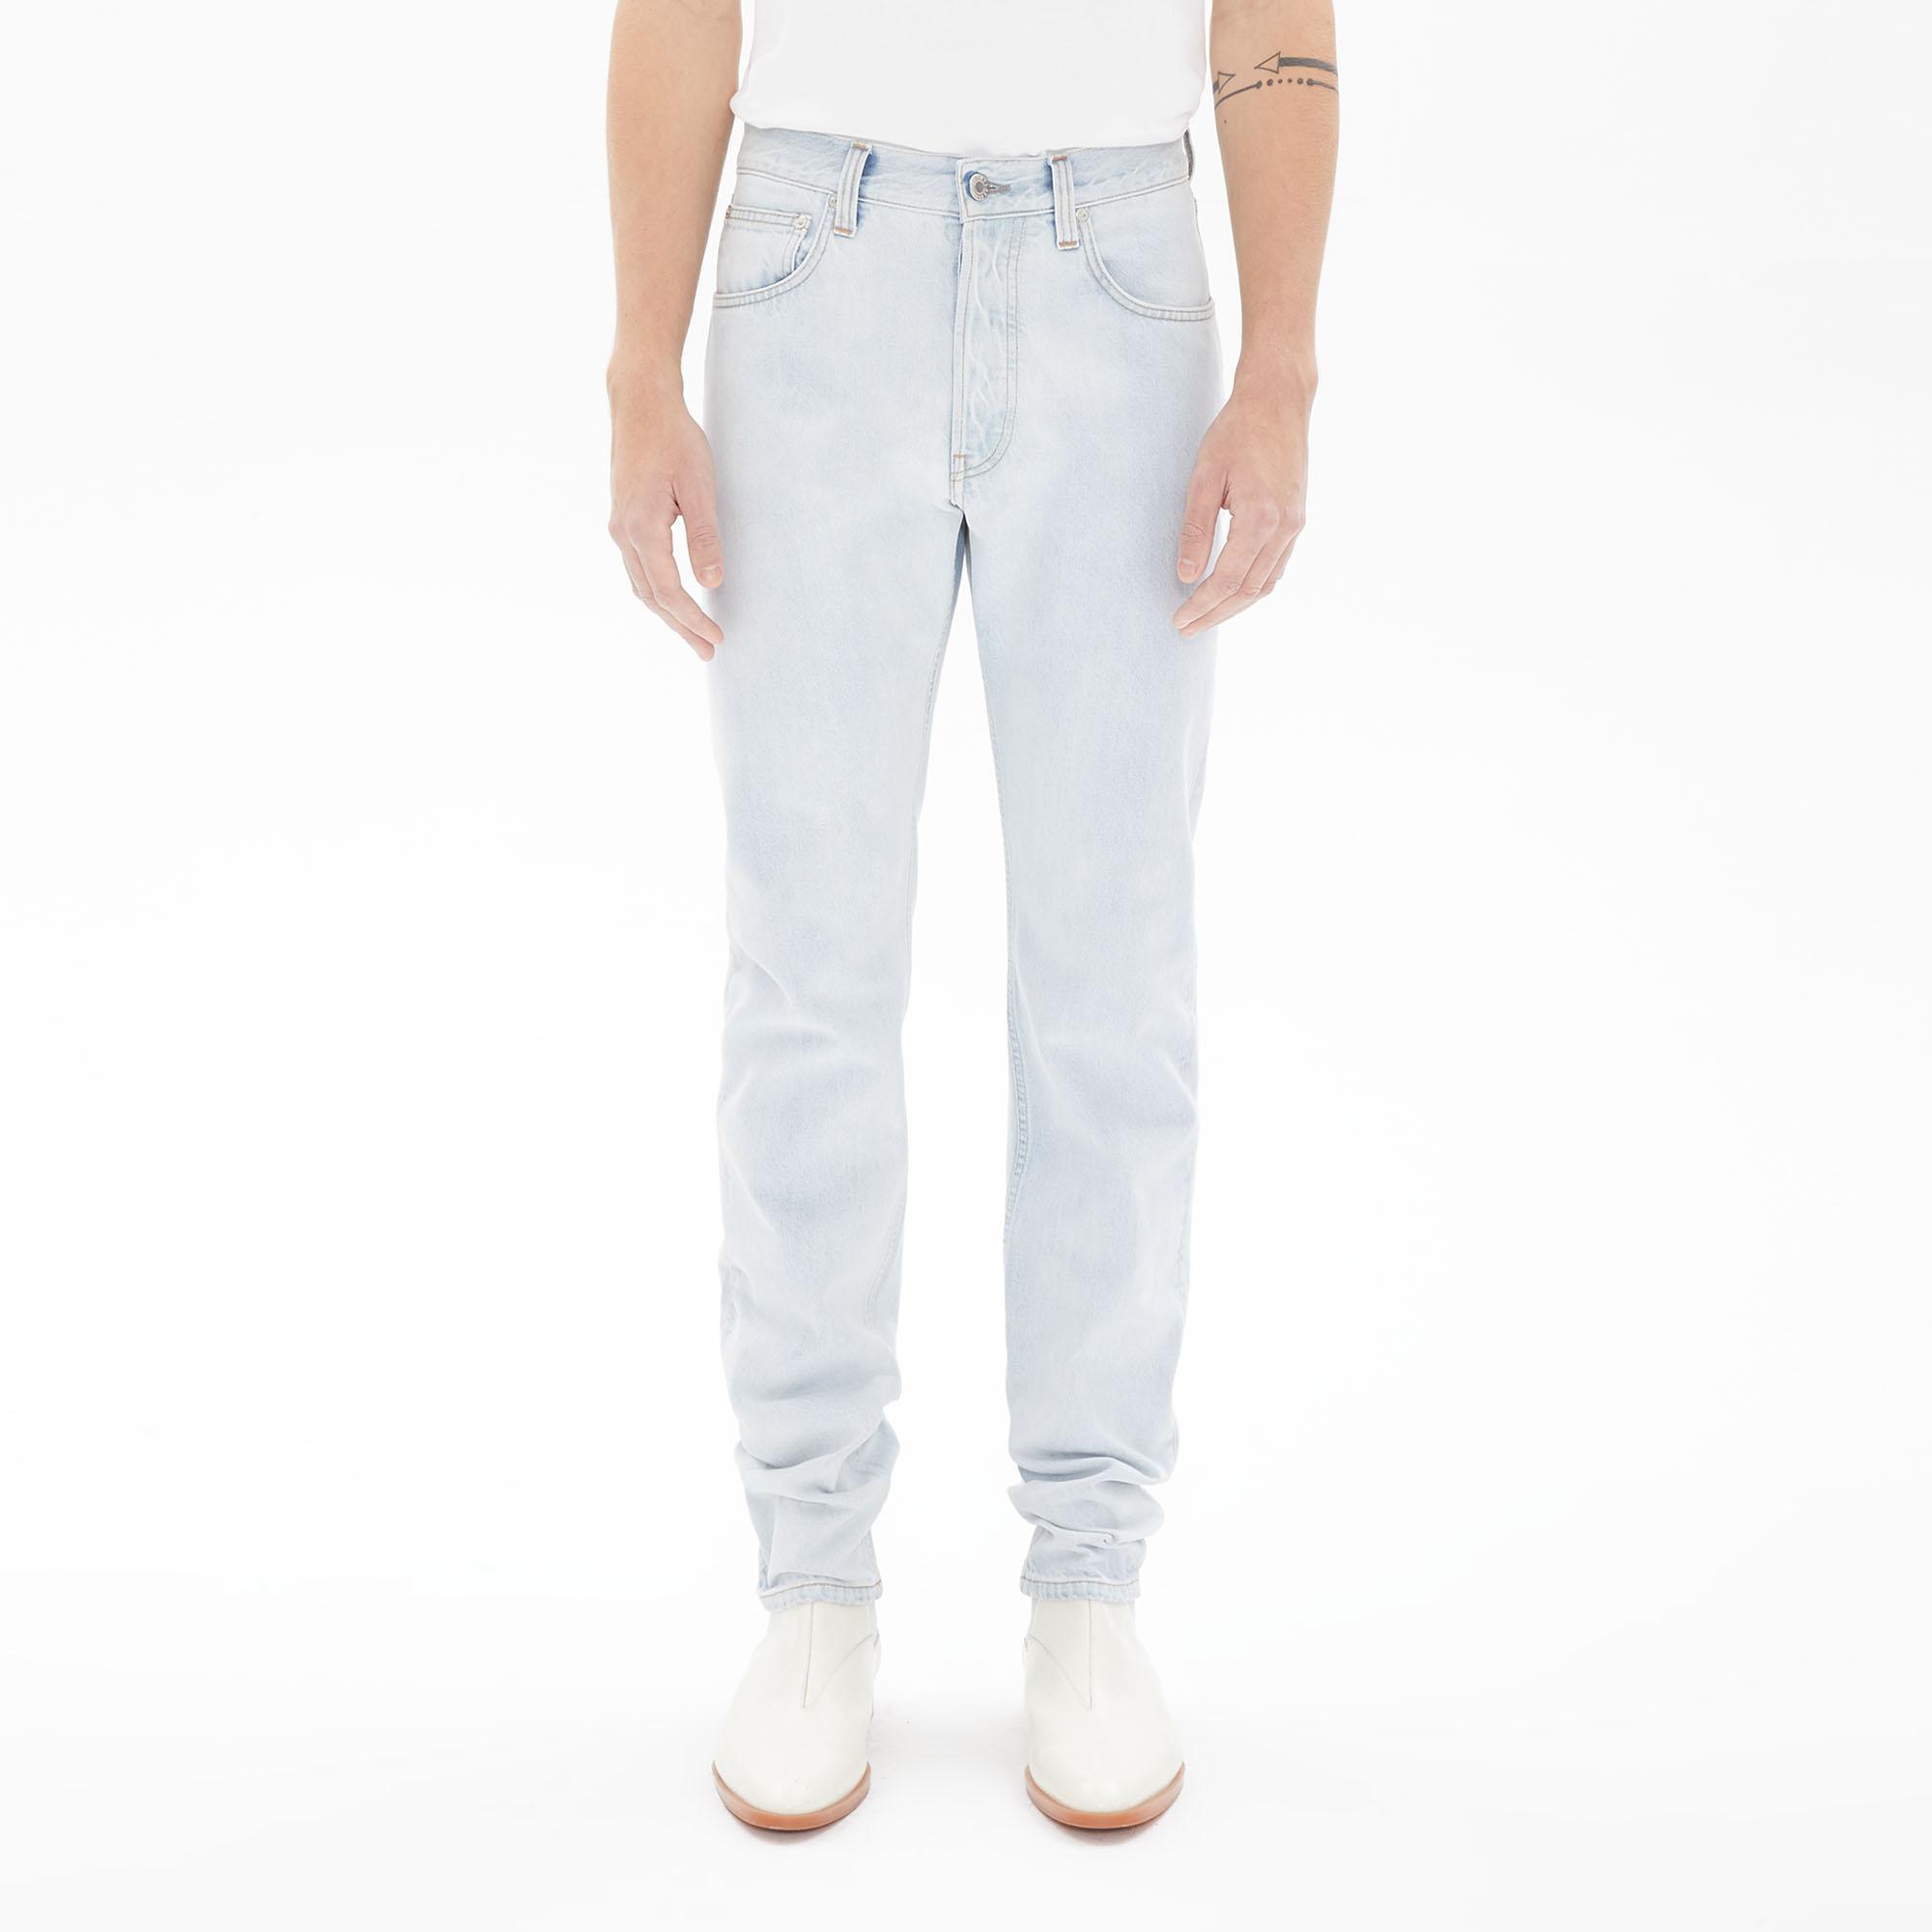 MASC HI STRAIGHT LEG JEANS by Helmut, available on helmutlang.com for ₹9800 Kim Kardashian Pants Exact Product